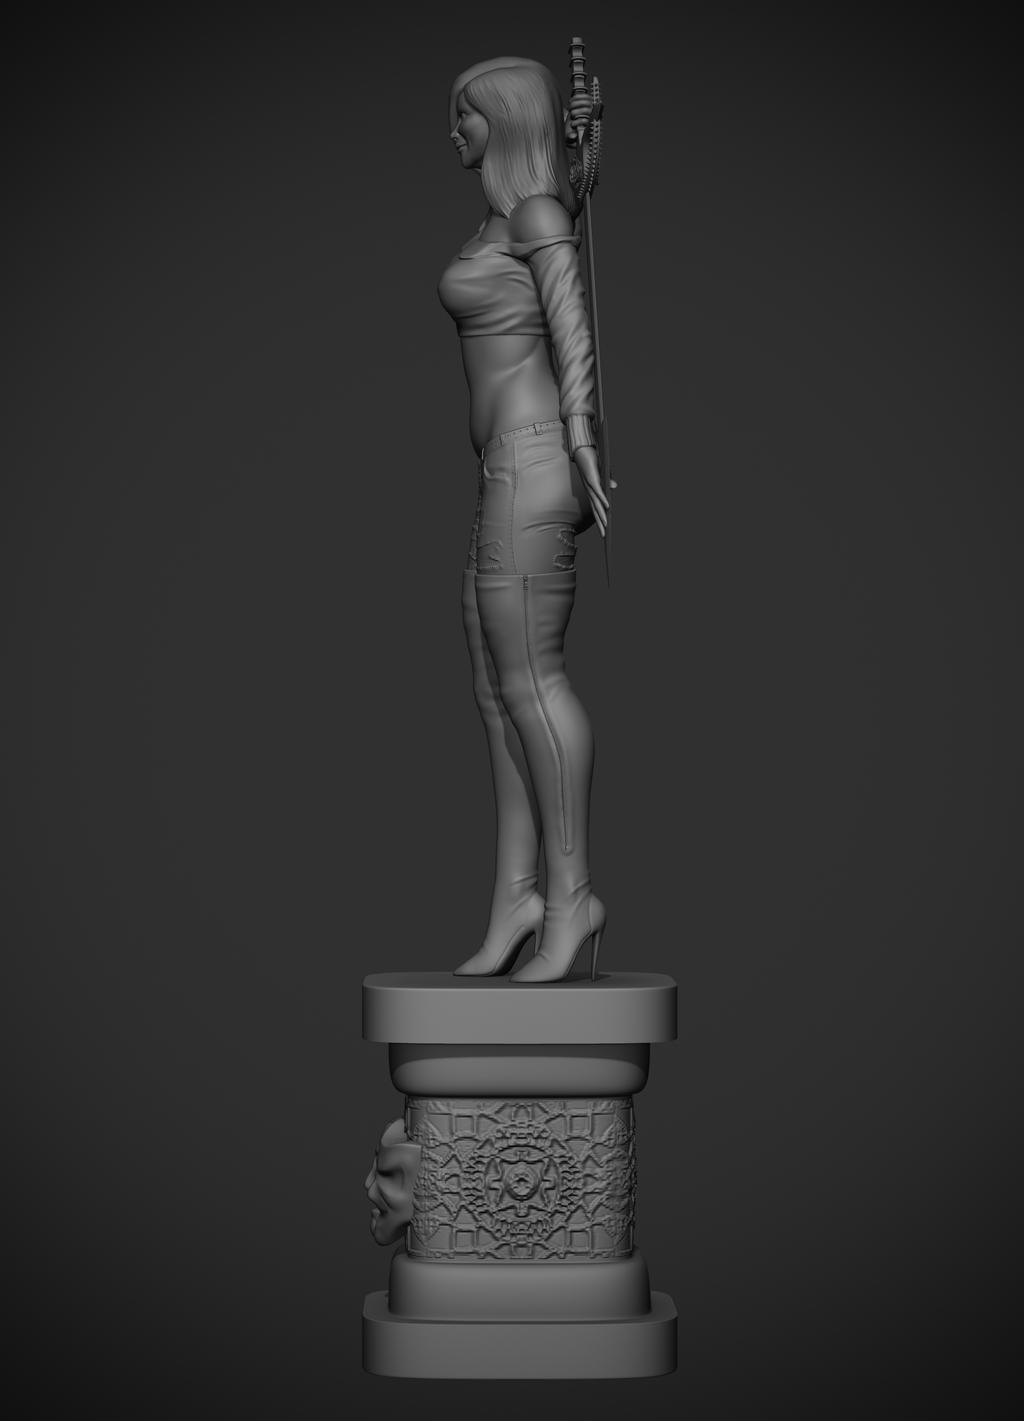 Joseph michael linsner's Dawn, digital sculpt by synn1978